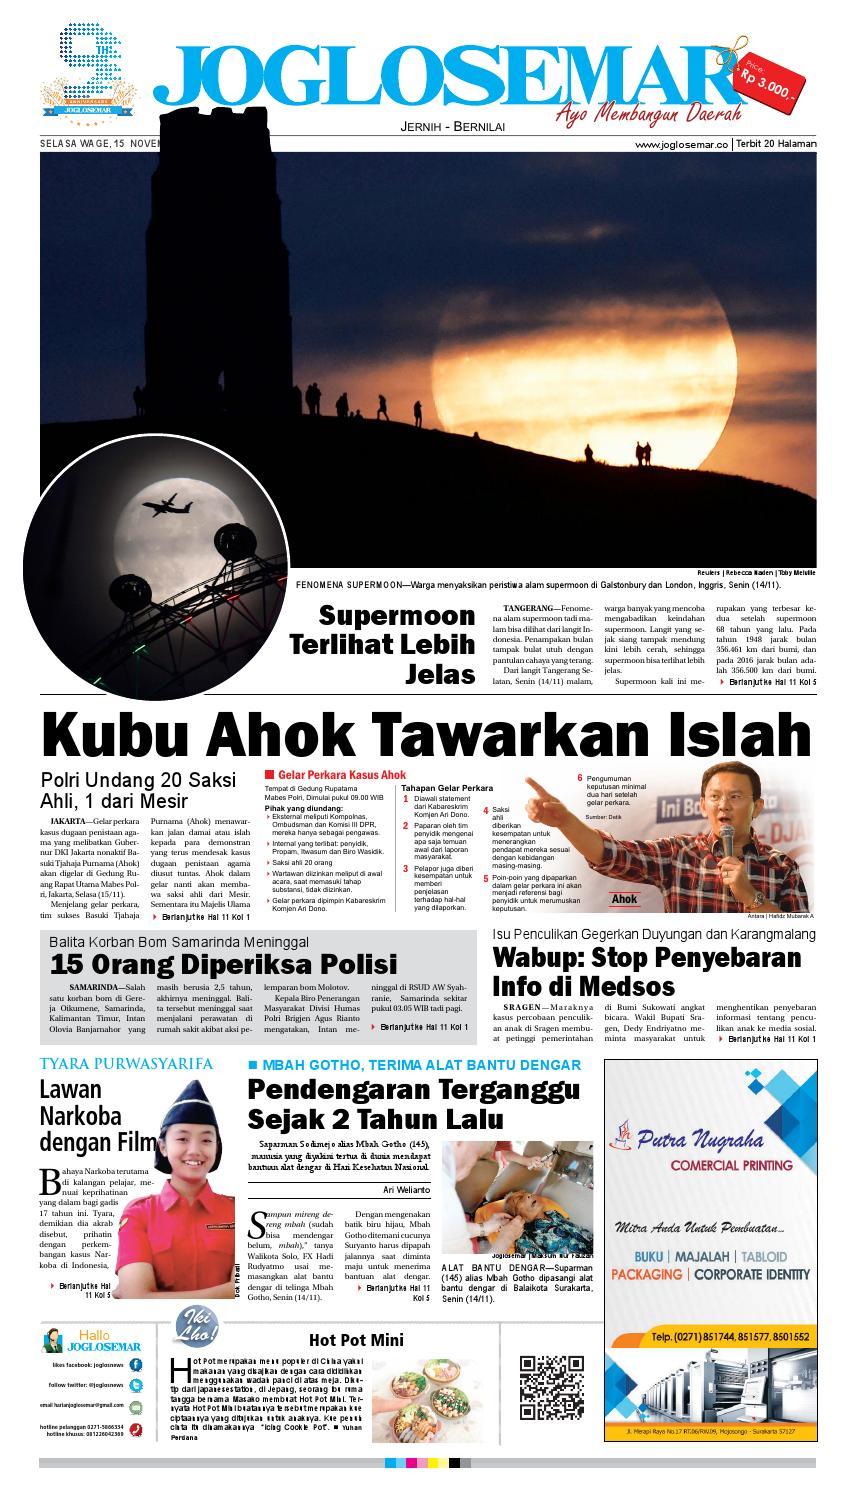 E Paper 15 November 2016 By PT Joglosemar Prima Media Issuu